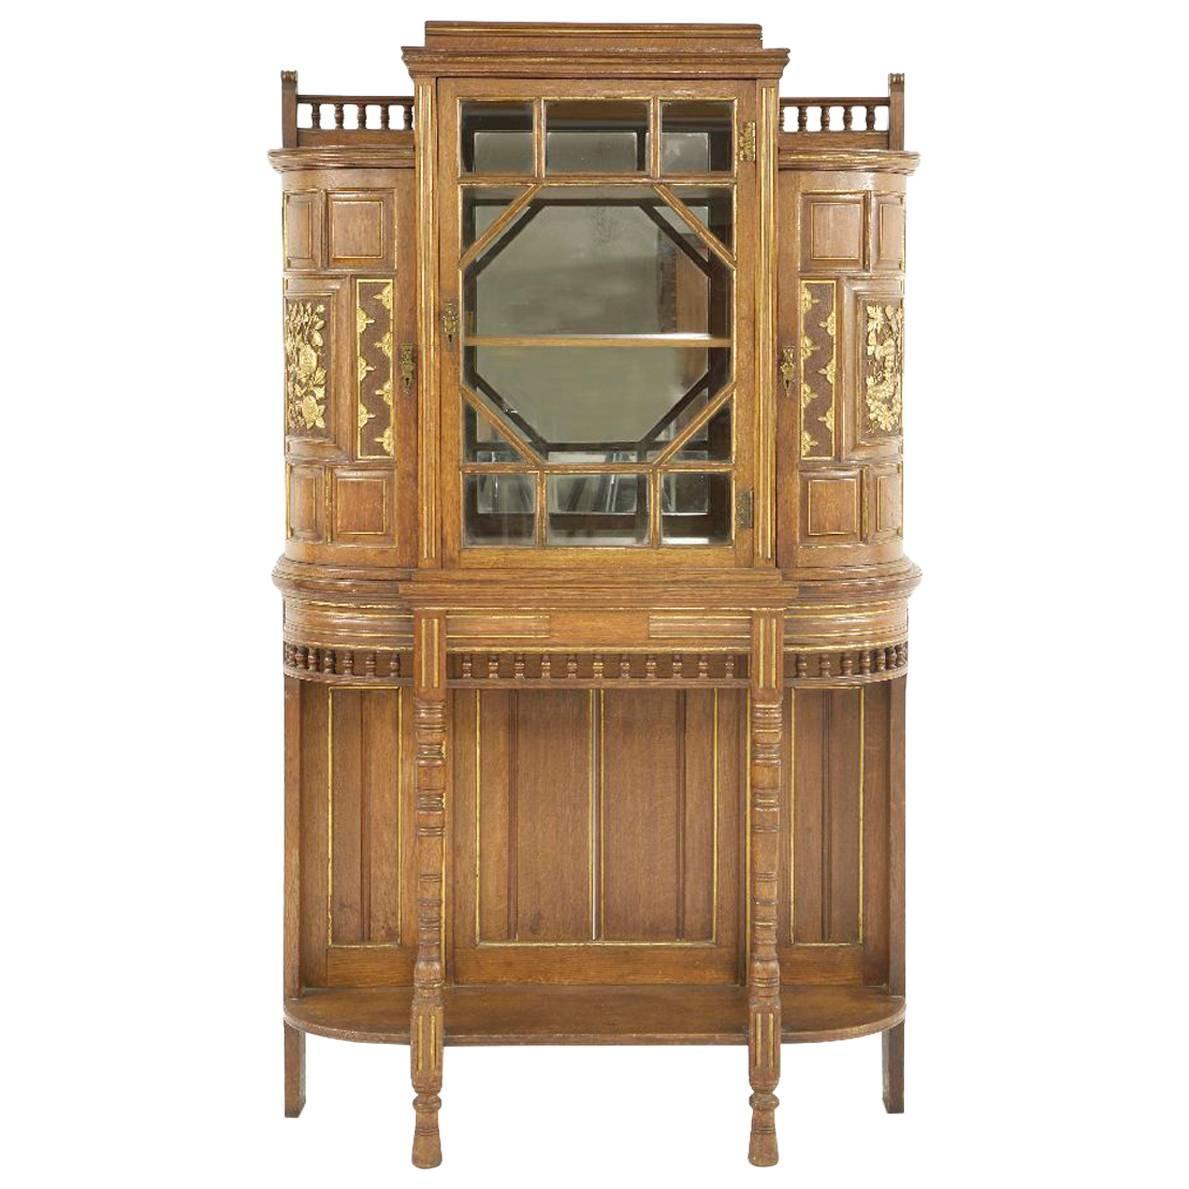 Bruce Talbert for Gillows attri, A Fine Aesthetic Movement Oak & Glazed Cabinet